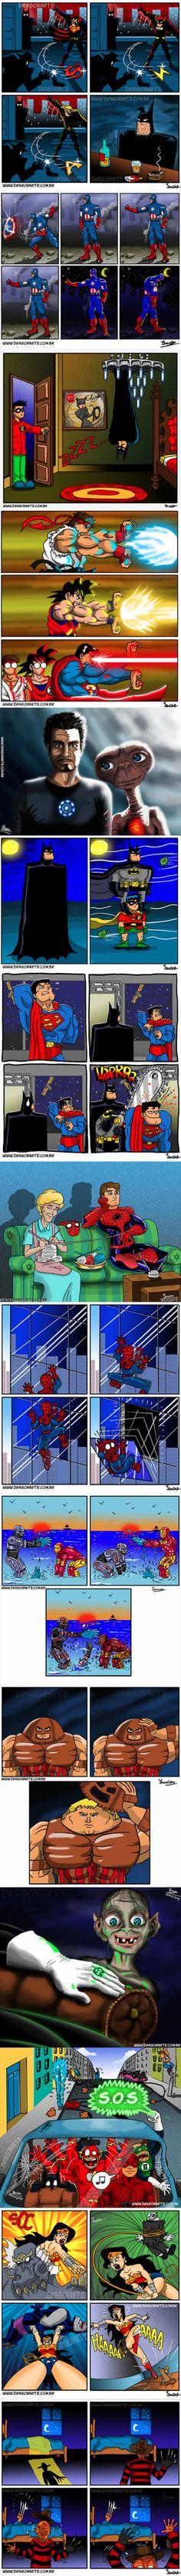 The Funniest Superhero Comics Collection (Part 3)